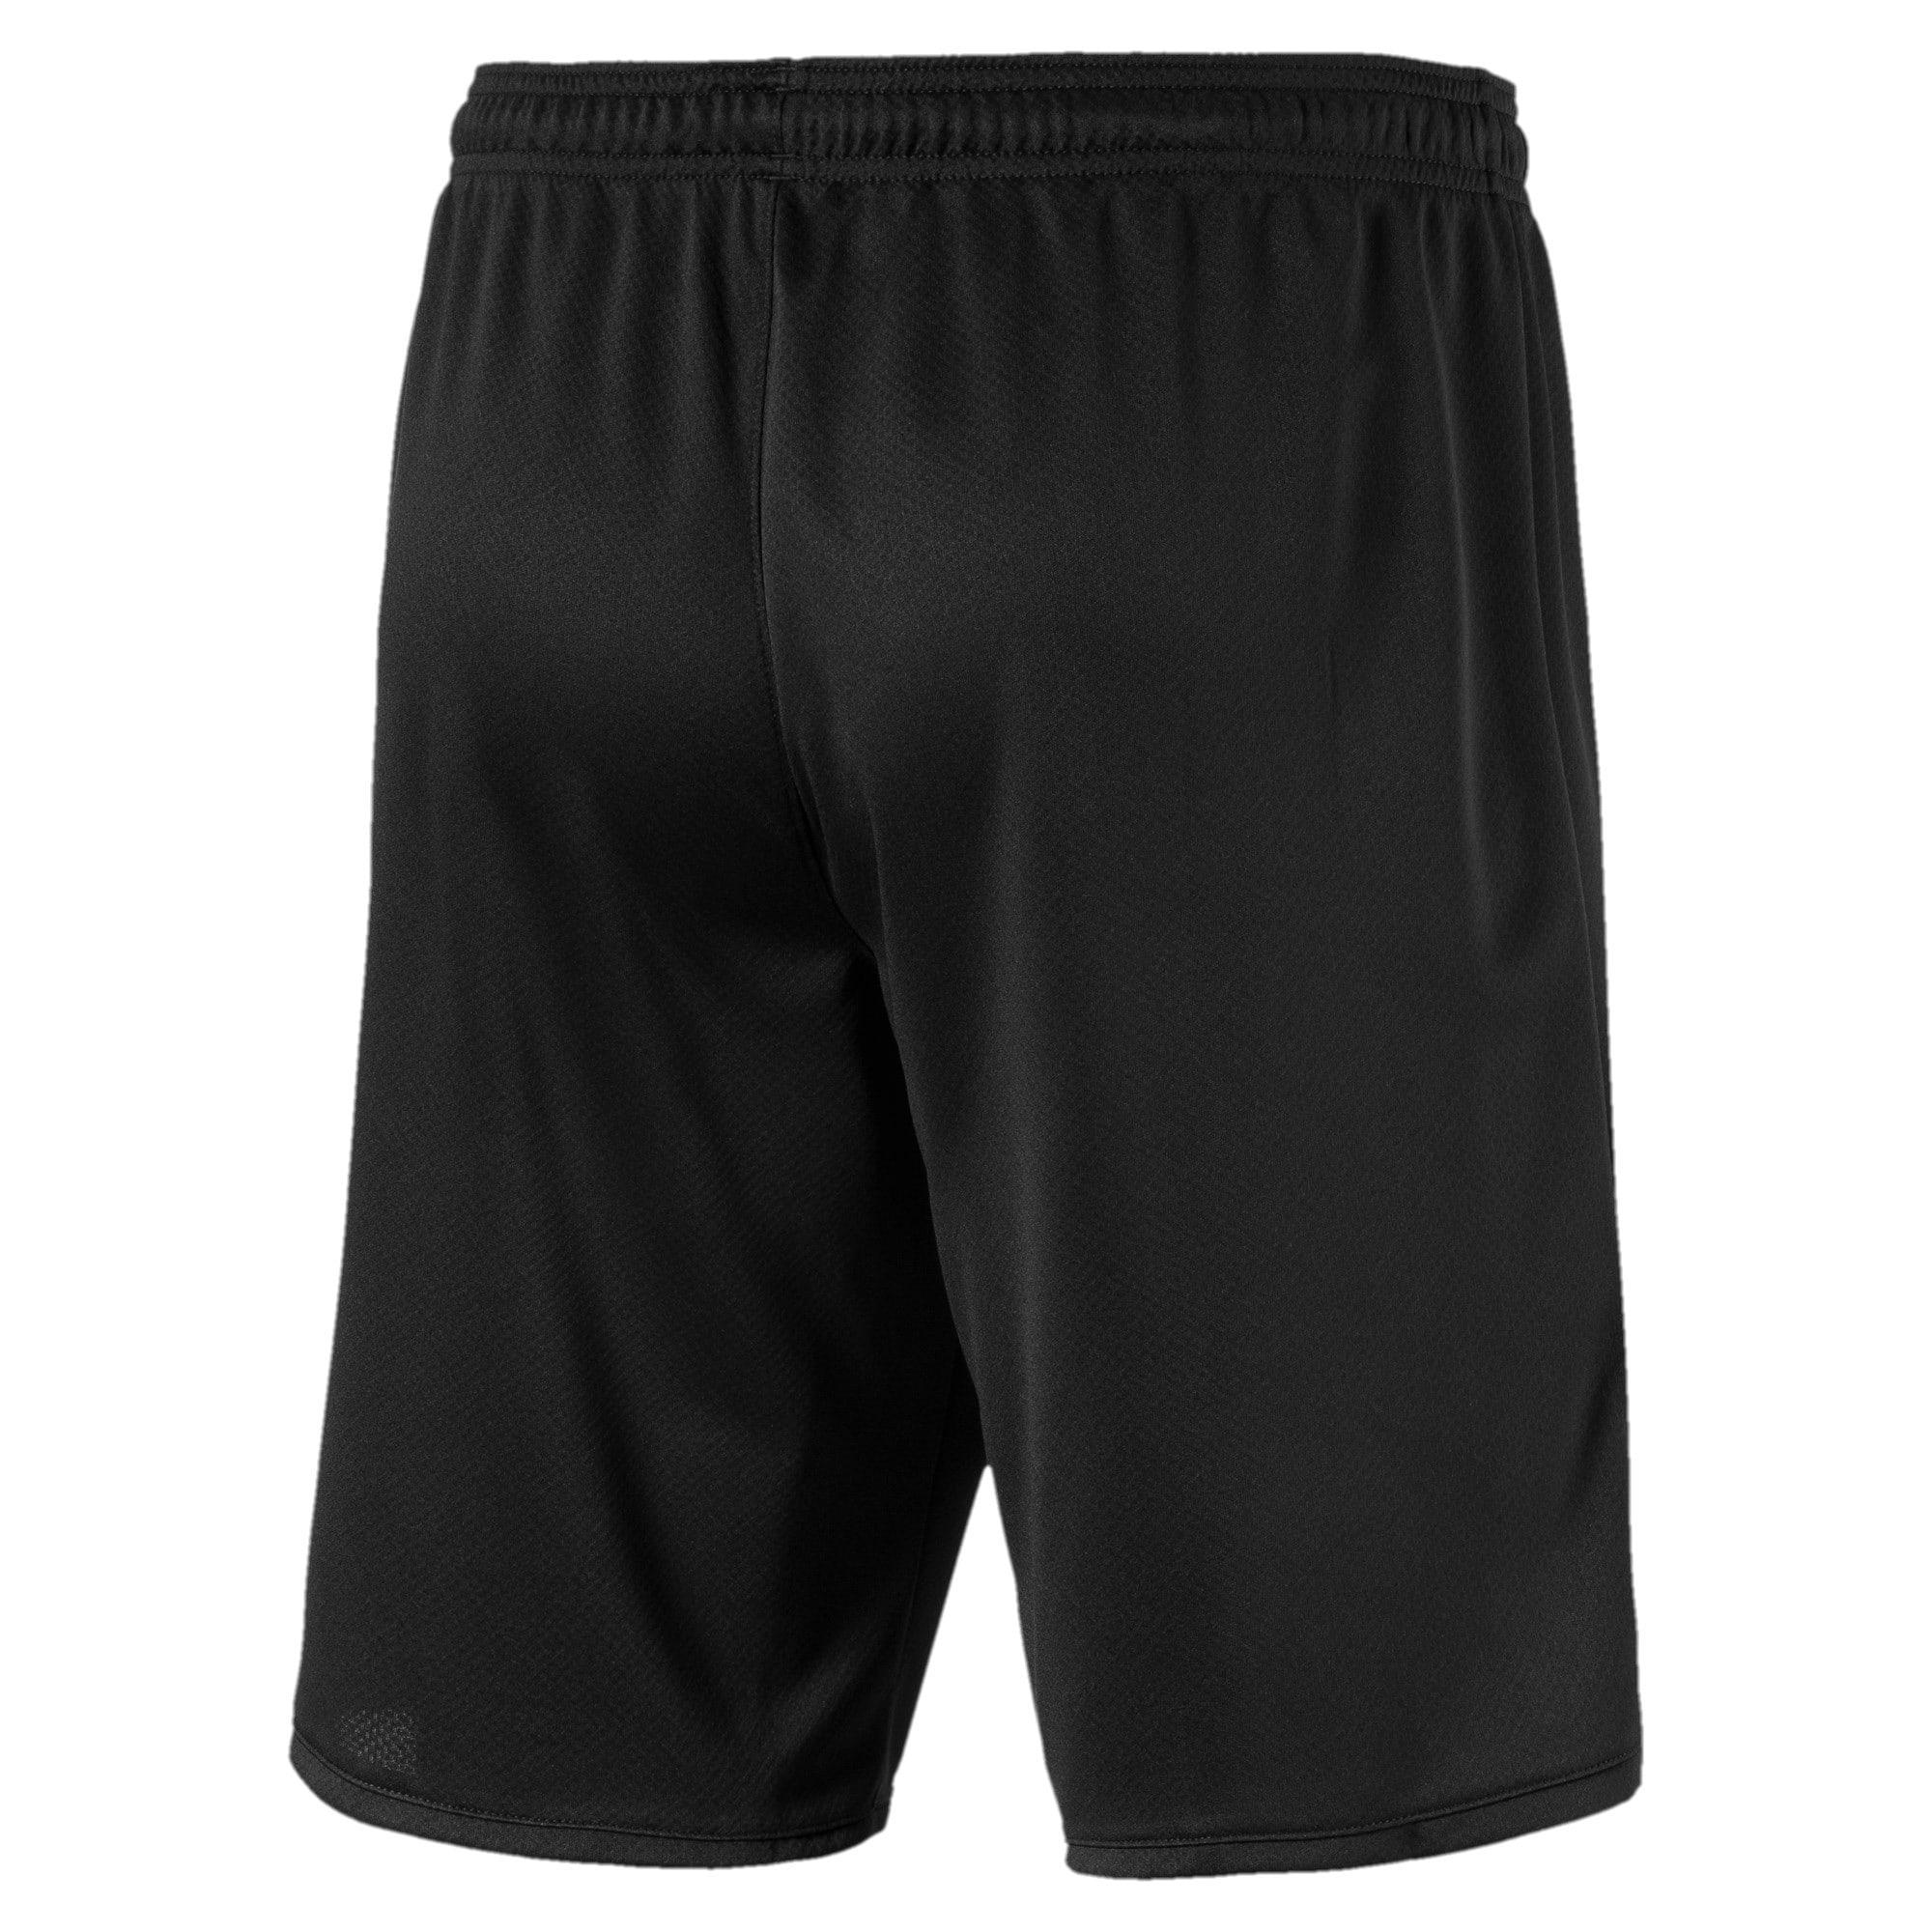 Thumbnail 2 of Man City Men's Third Replica Shorts, Puma Black-Georgia Peach, medium